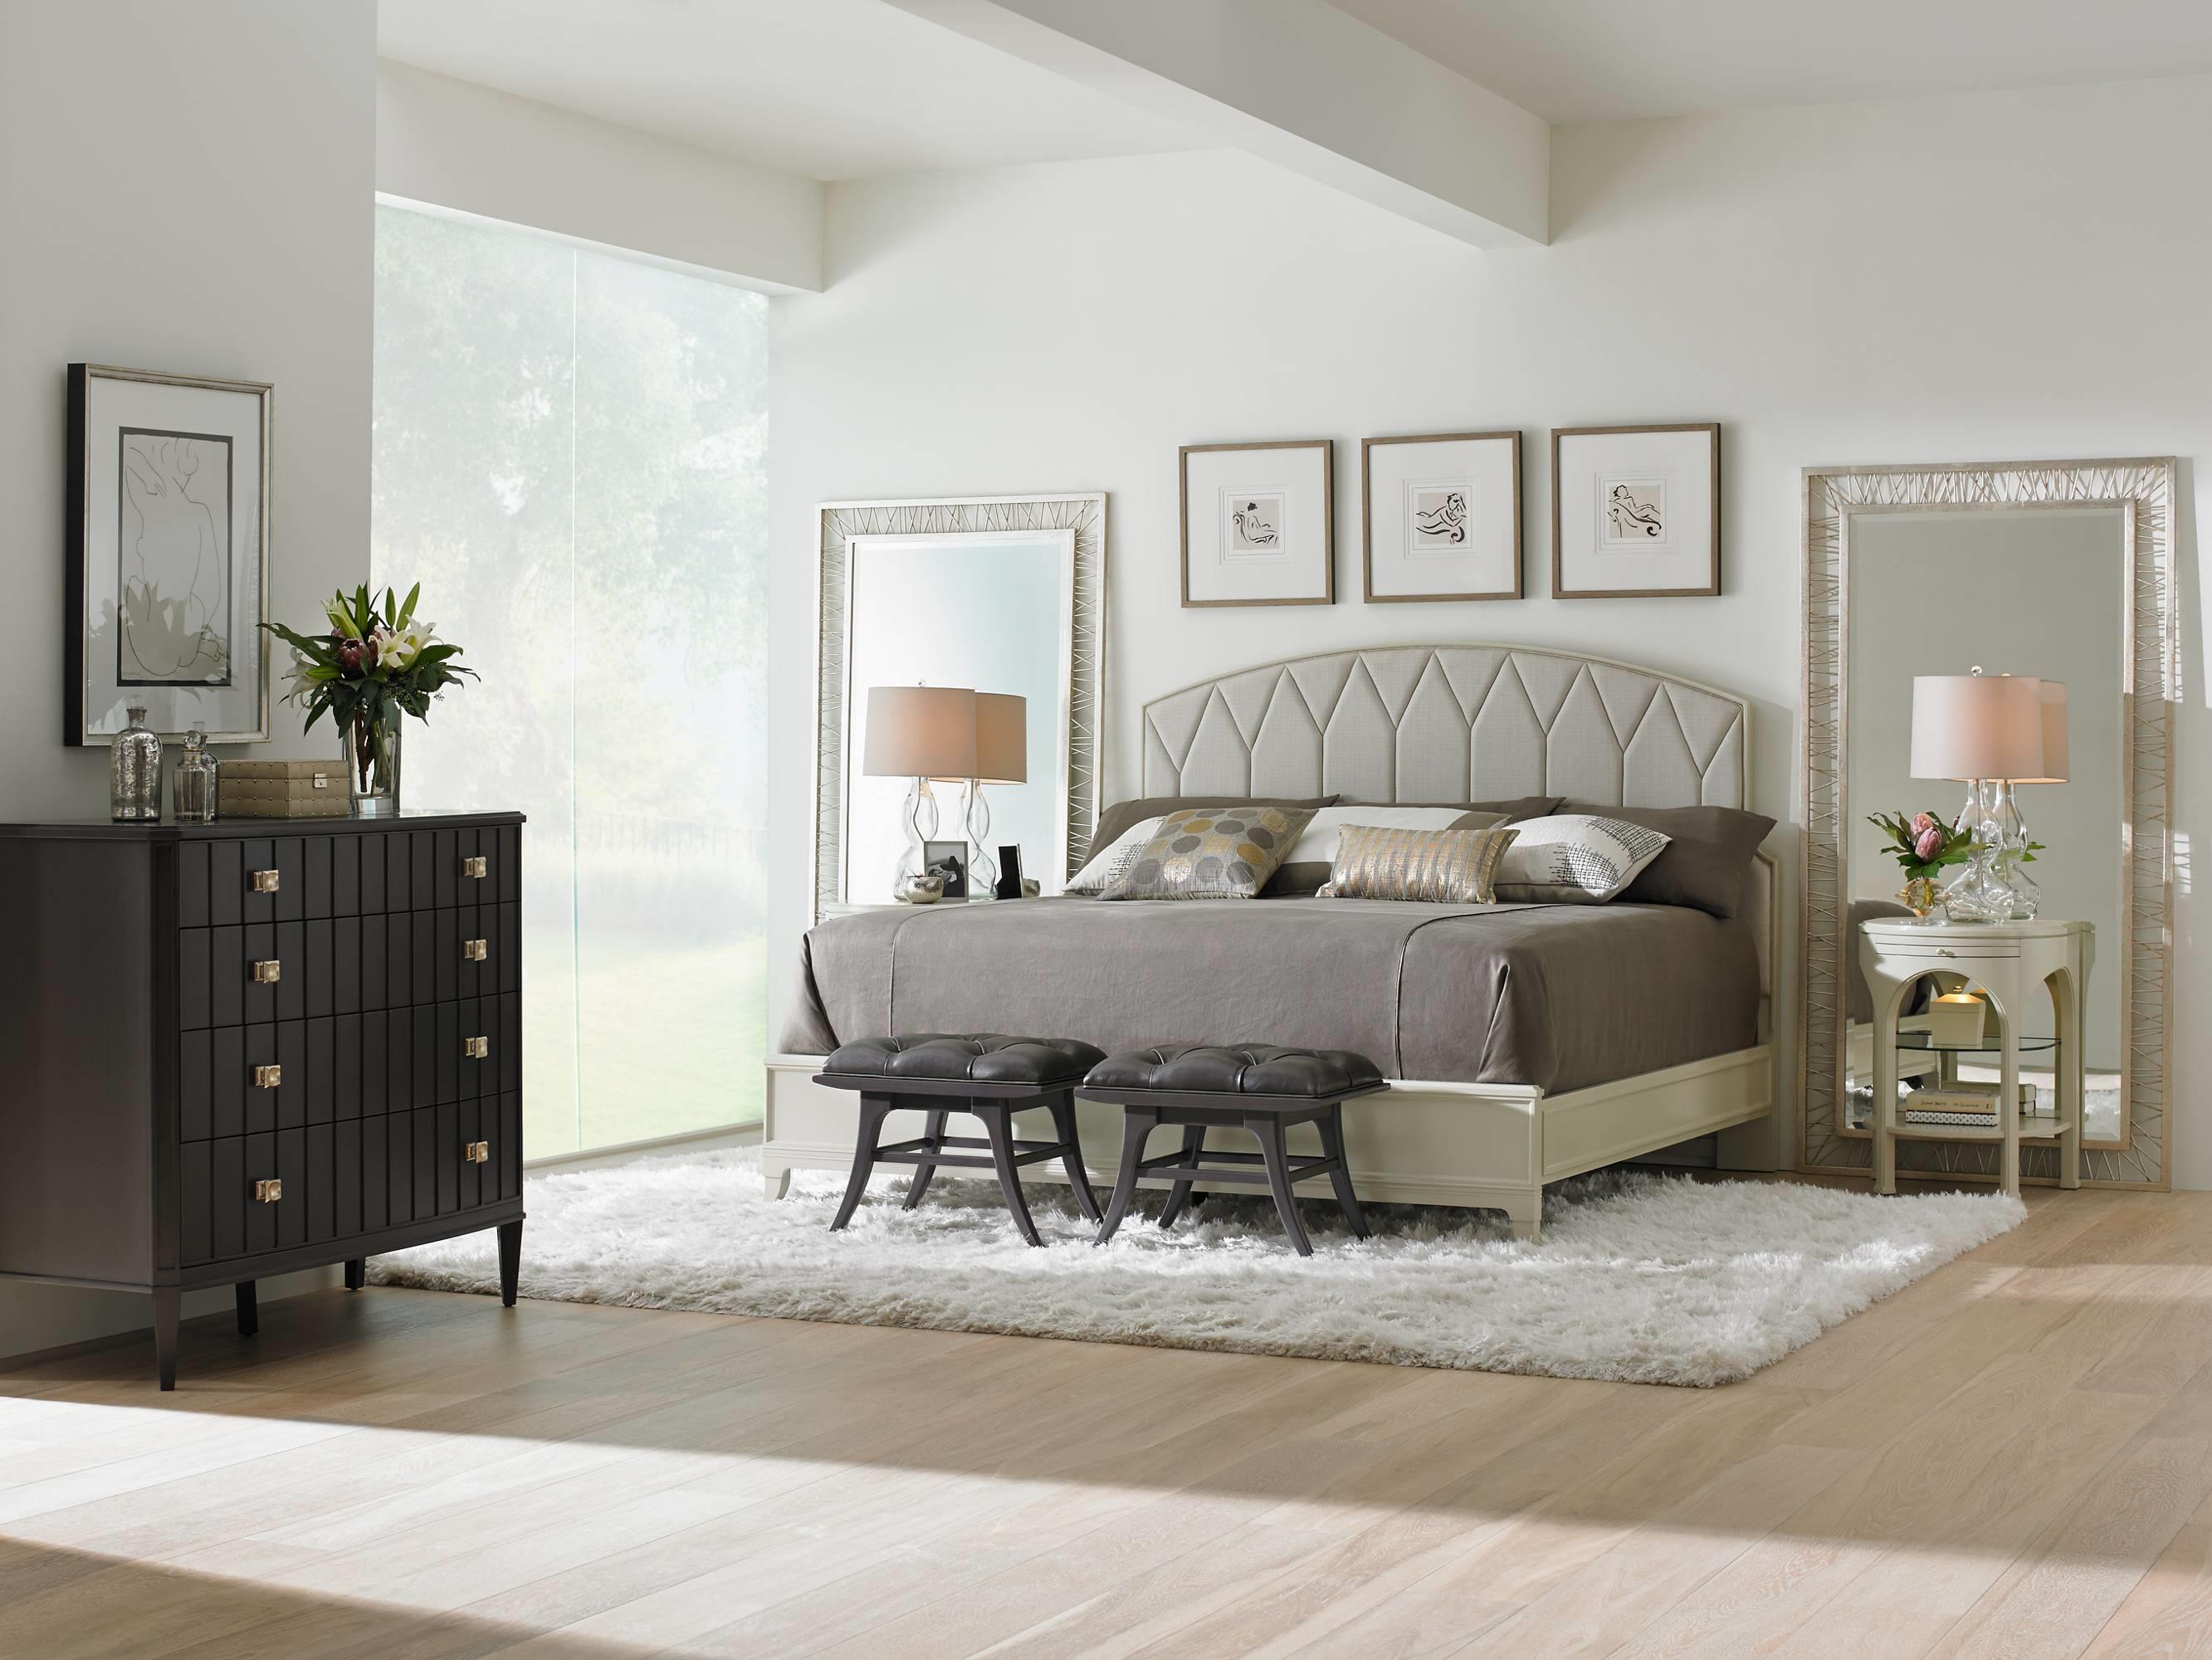 Stanley Furniture Crestaire California King Bedroom Group - Item Number: 436-2 CK Bedroom Group 2